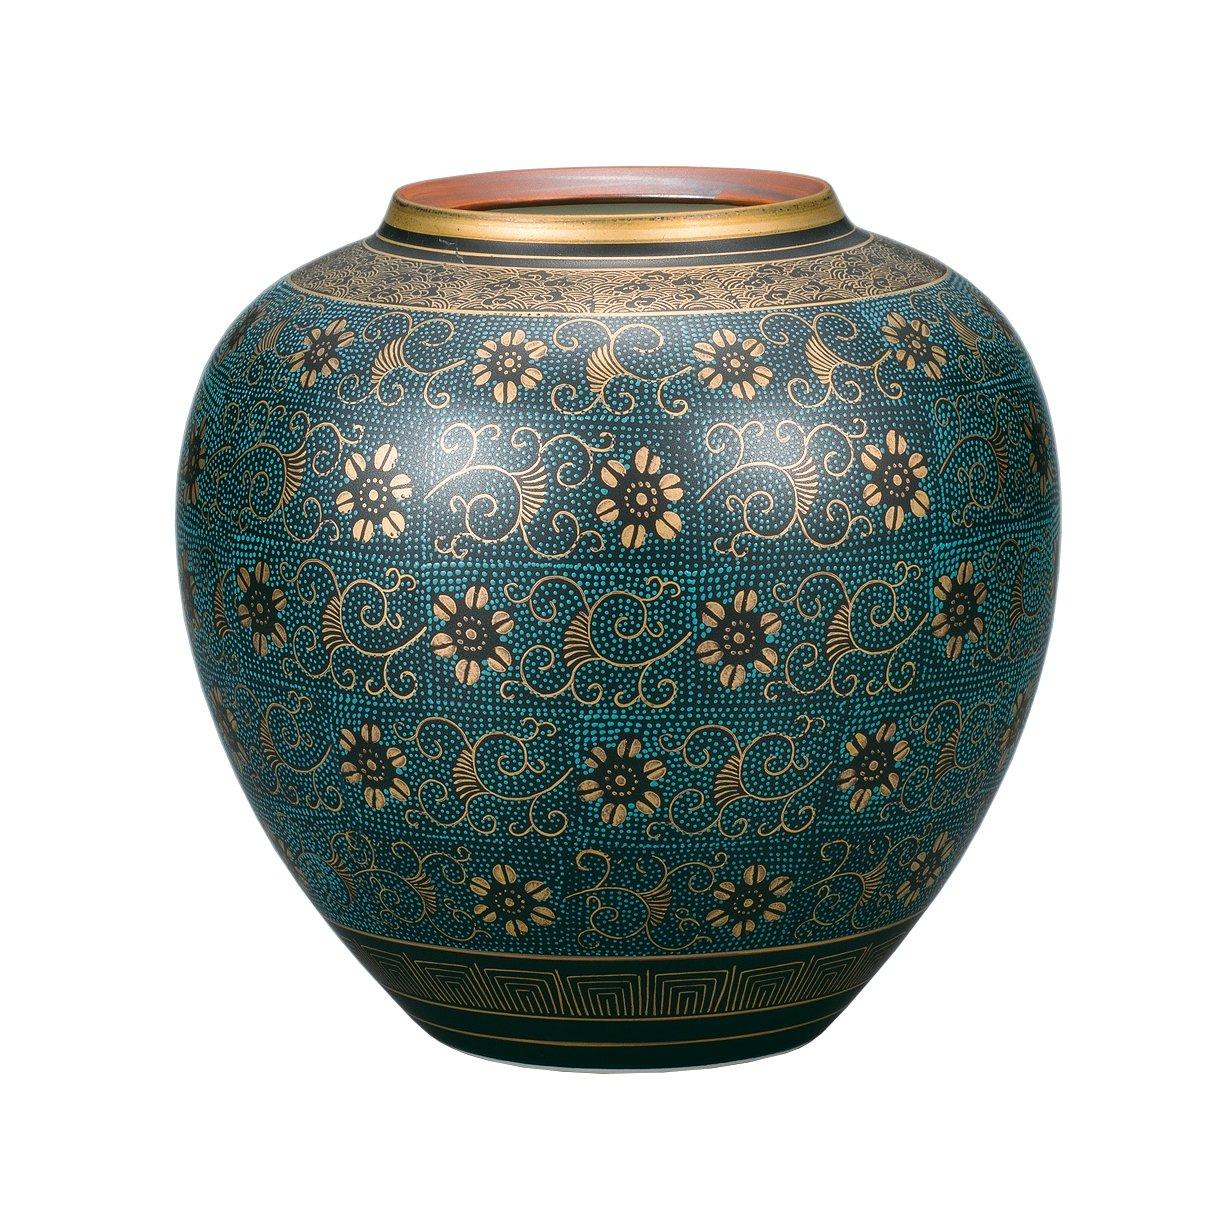 マルサン宮本 九谷焼 8号花瓶 青粒鉄仙 AP4-1051 B076GL35VB